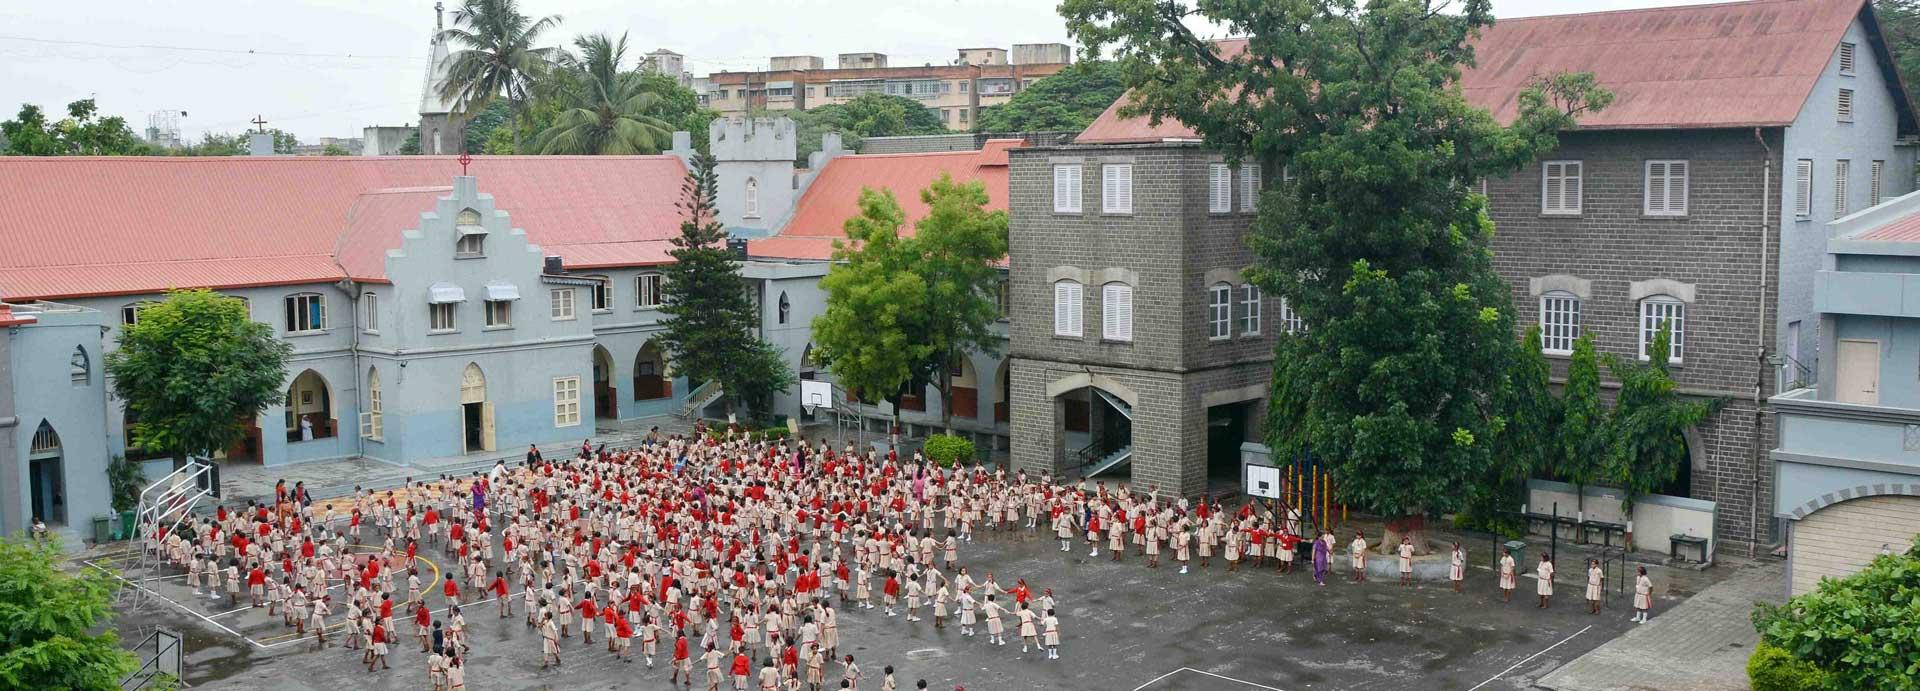 St. Anne's School Pune